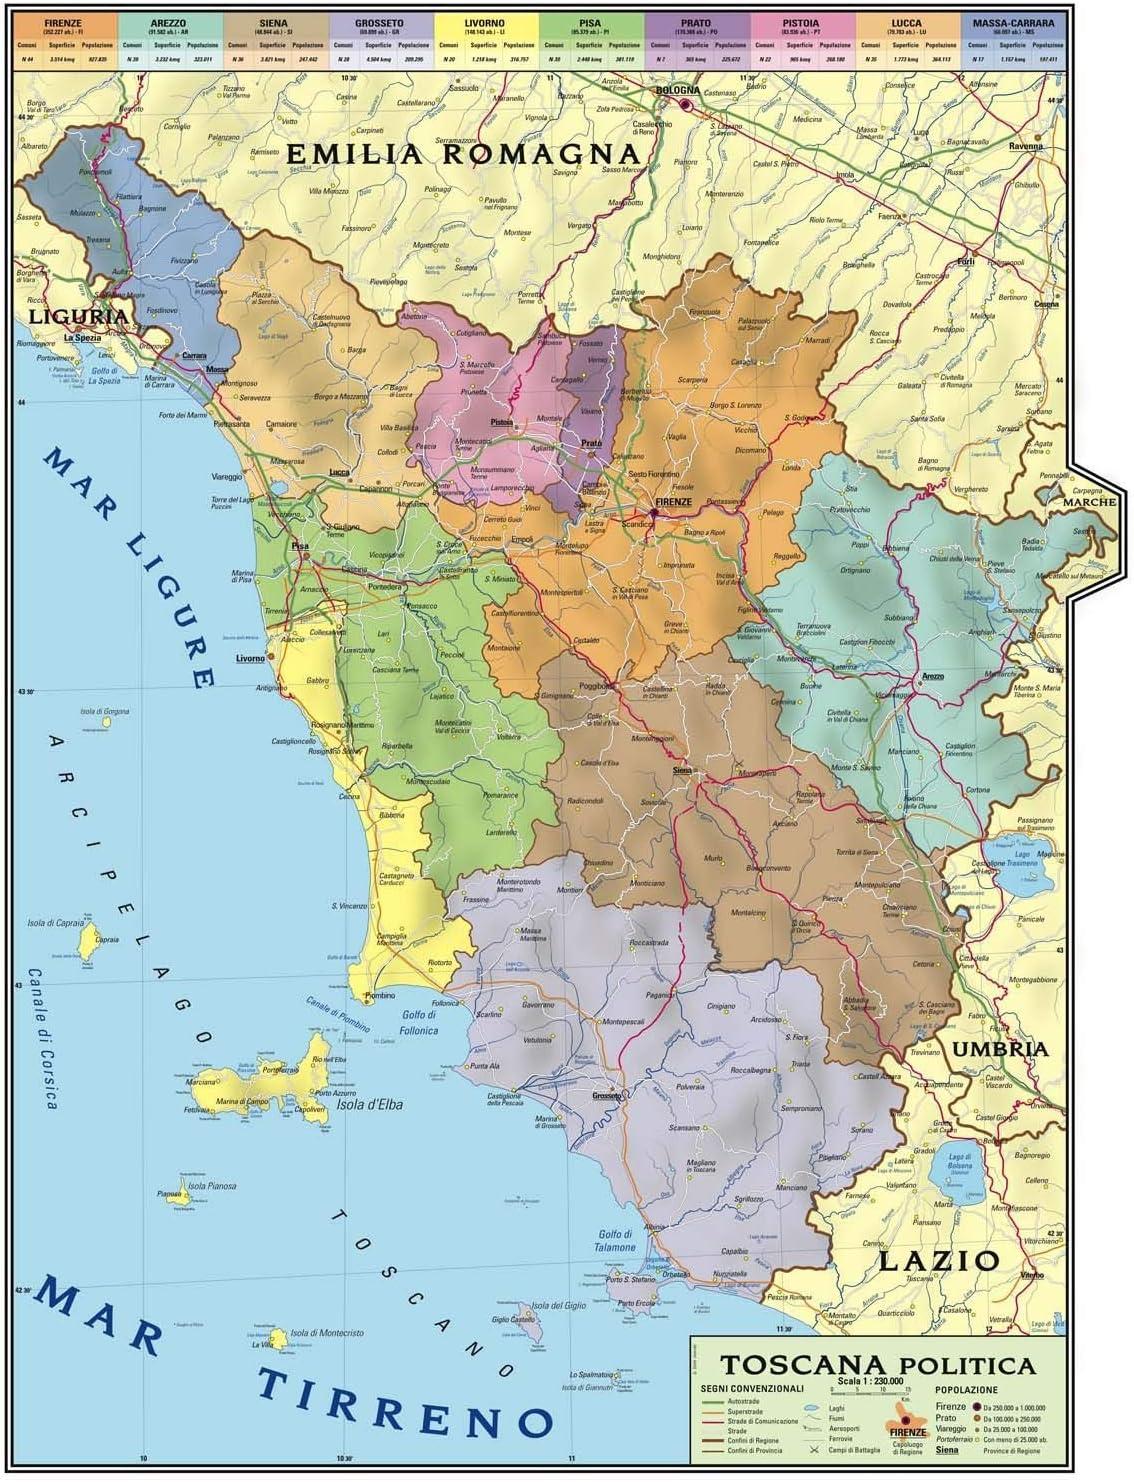 Cartina Toscana Da Stampare.Pedale Pistola Mensa Liguria Cartina Fisica E Politica Amazon Agingtheafricanlion Org